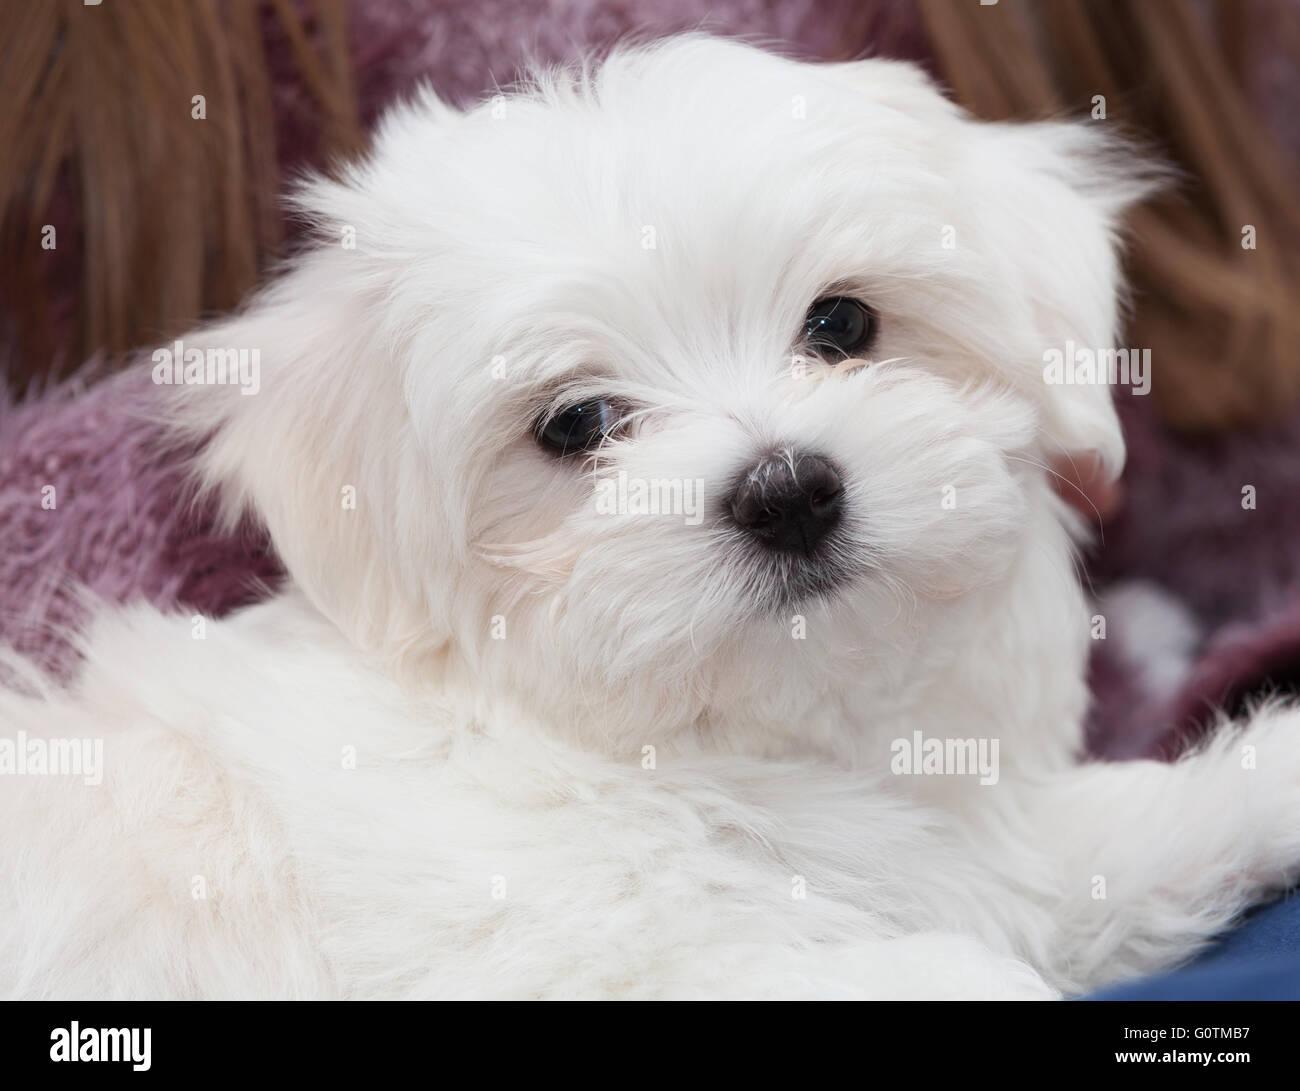 cute white fluffy maltese puppy stock photo 103805051 alamy